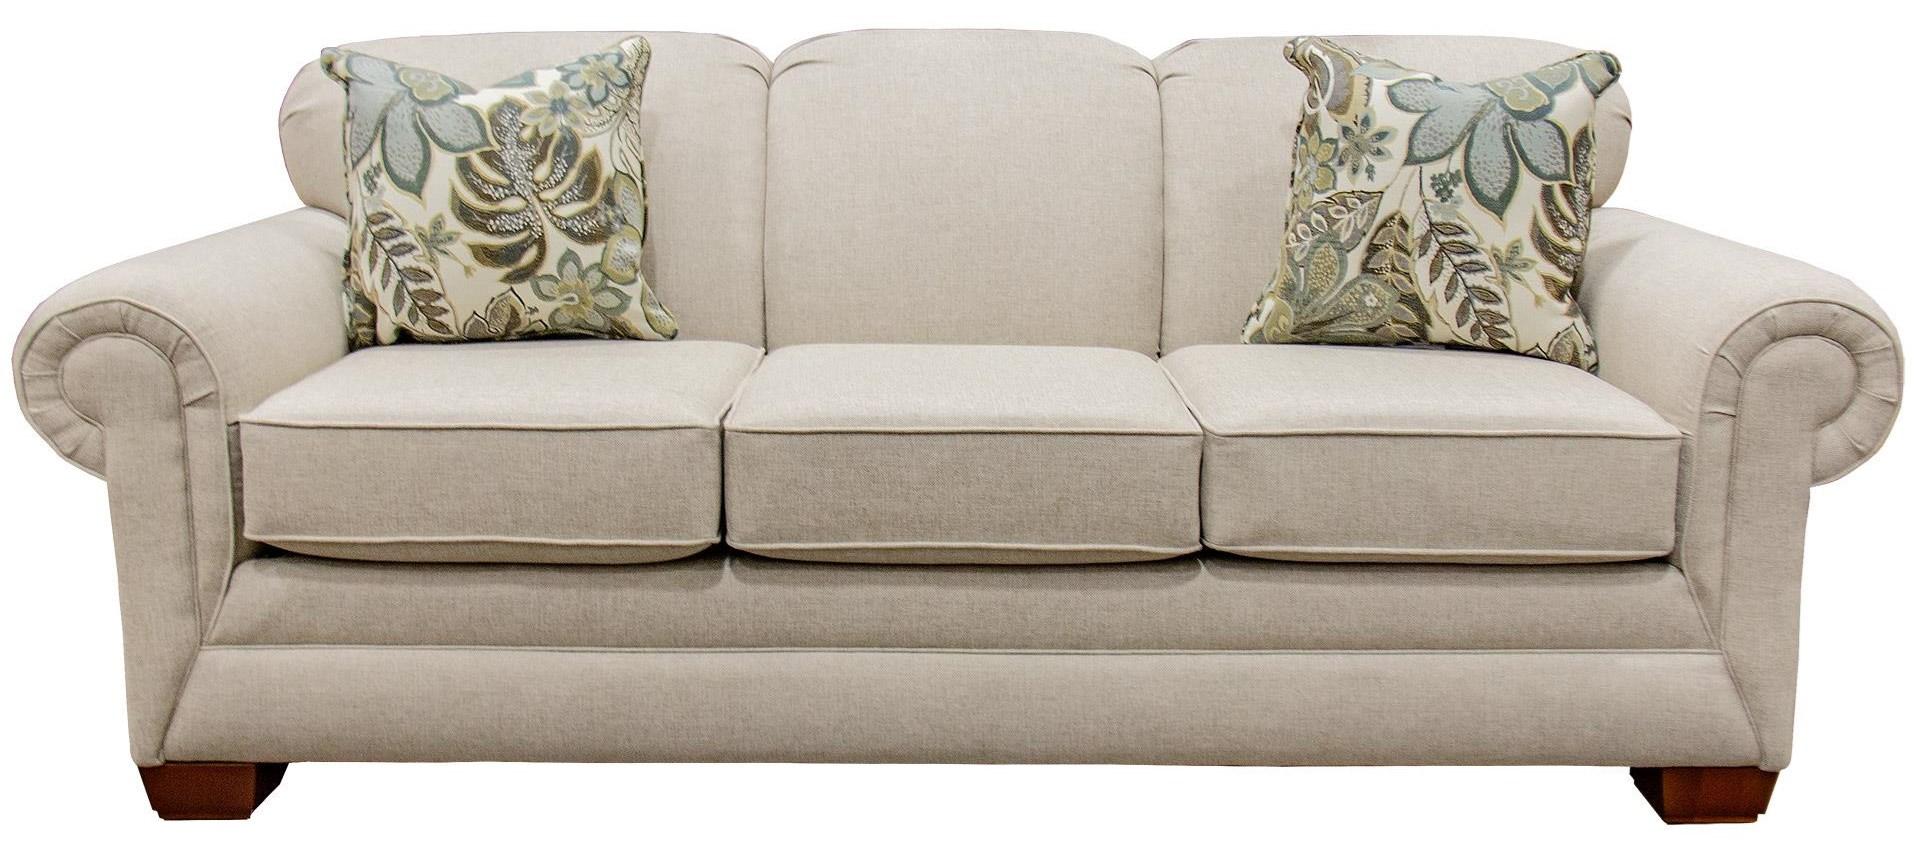 England Monroe Sofa   Item Number: 1435GRANDE LINENOCEAN ISLE SPA